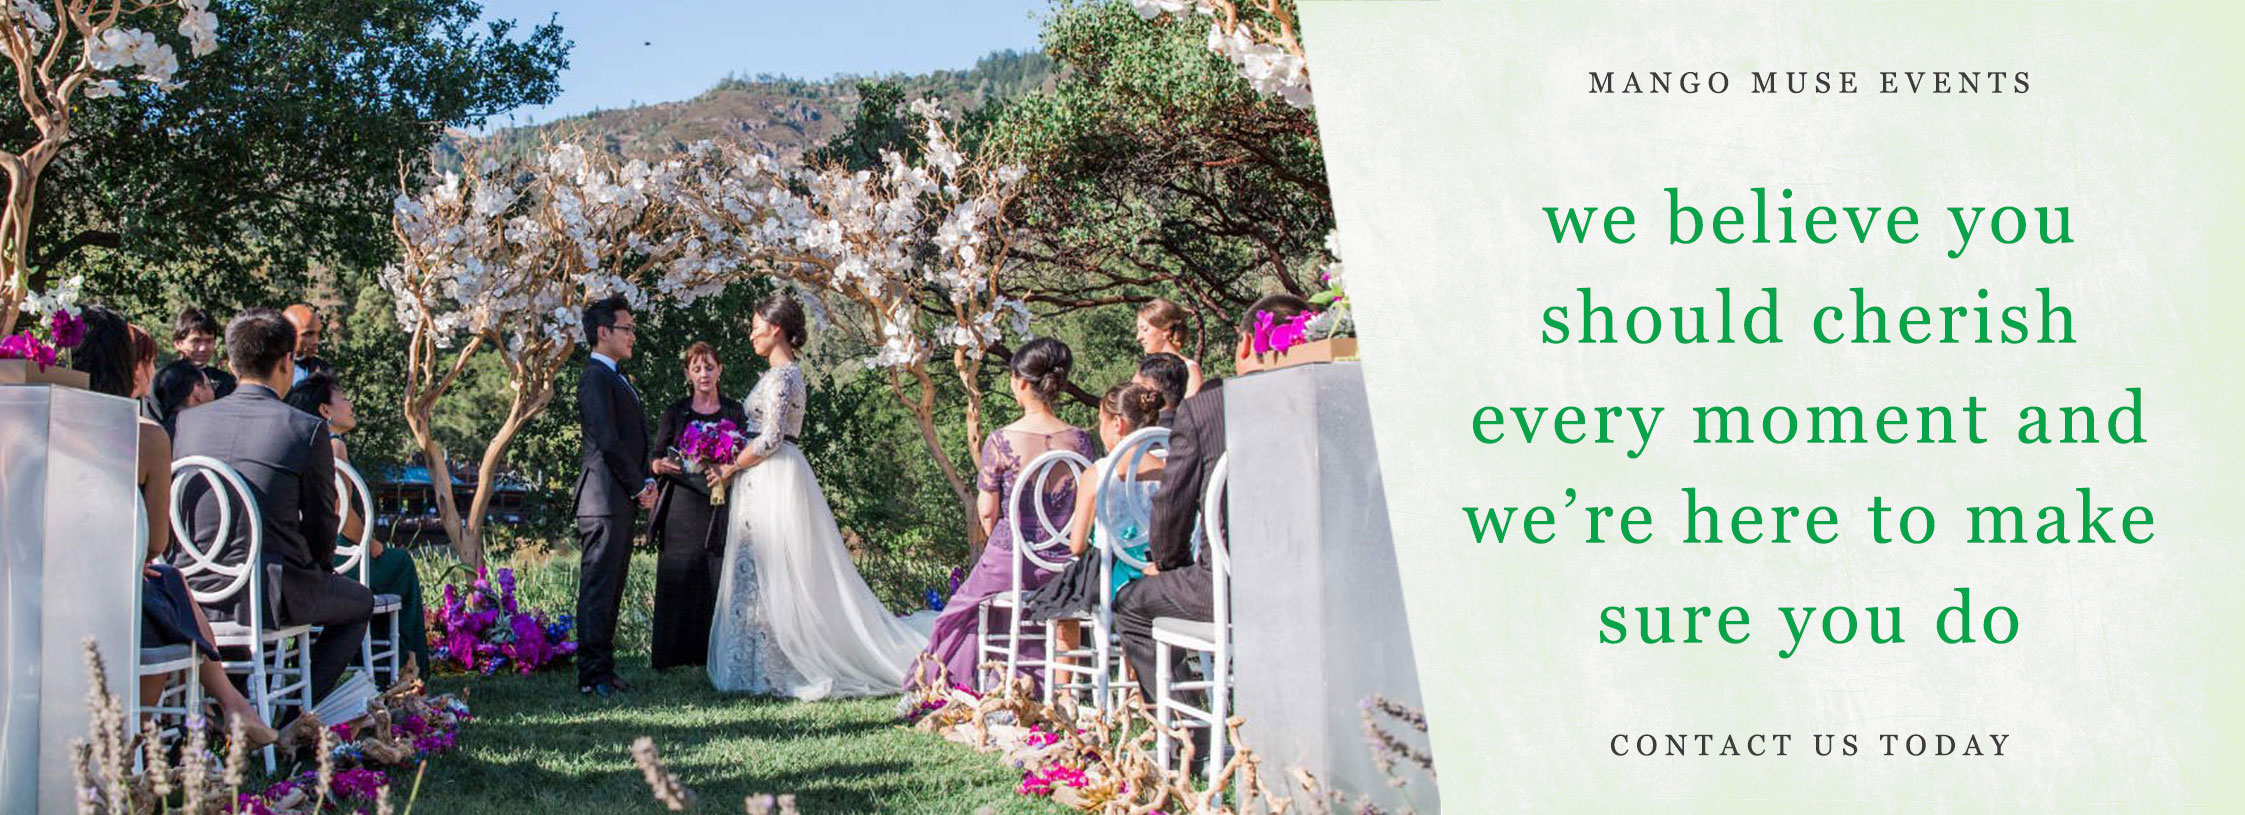 Luxury Calistoga Ranch wedding by Destination wedding planner Mango Muse Events